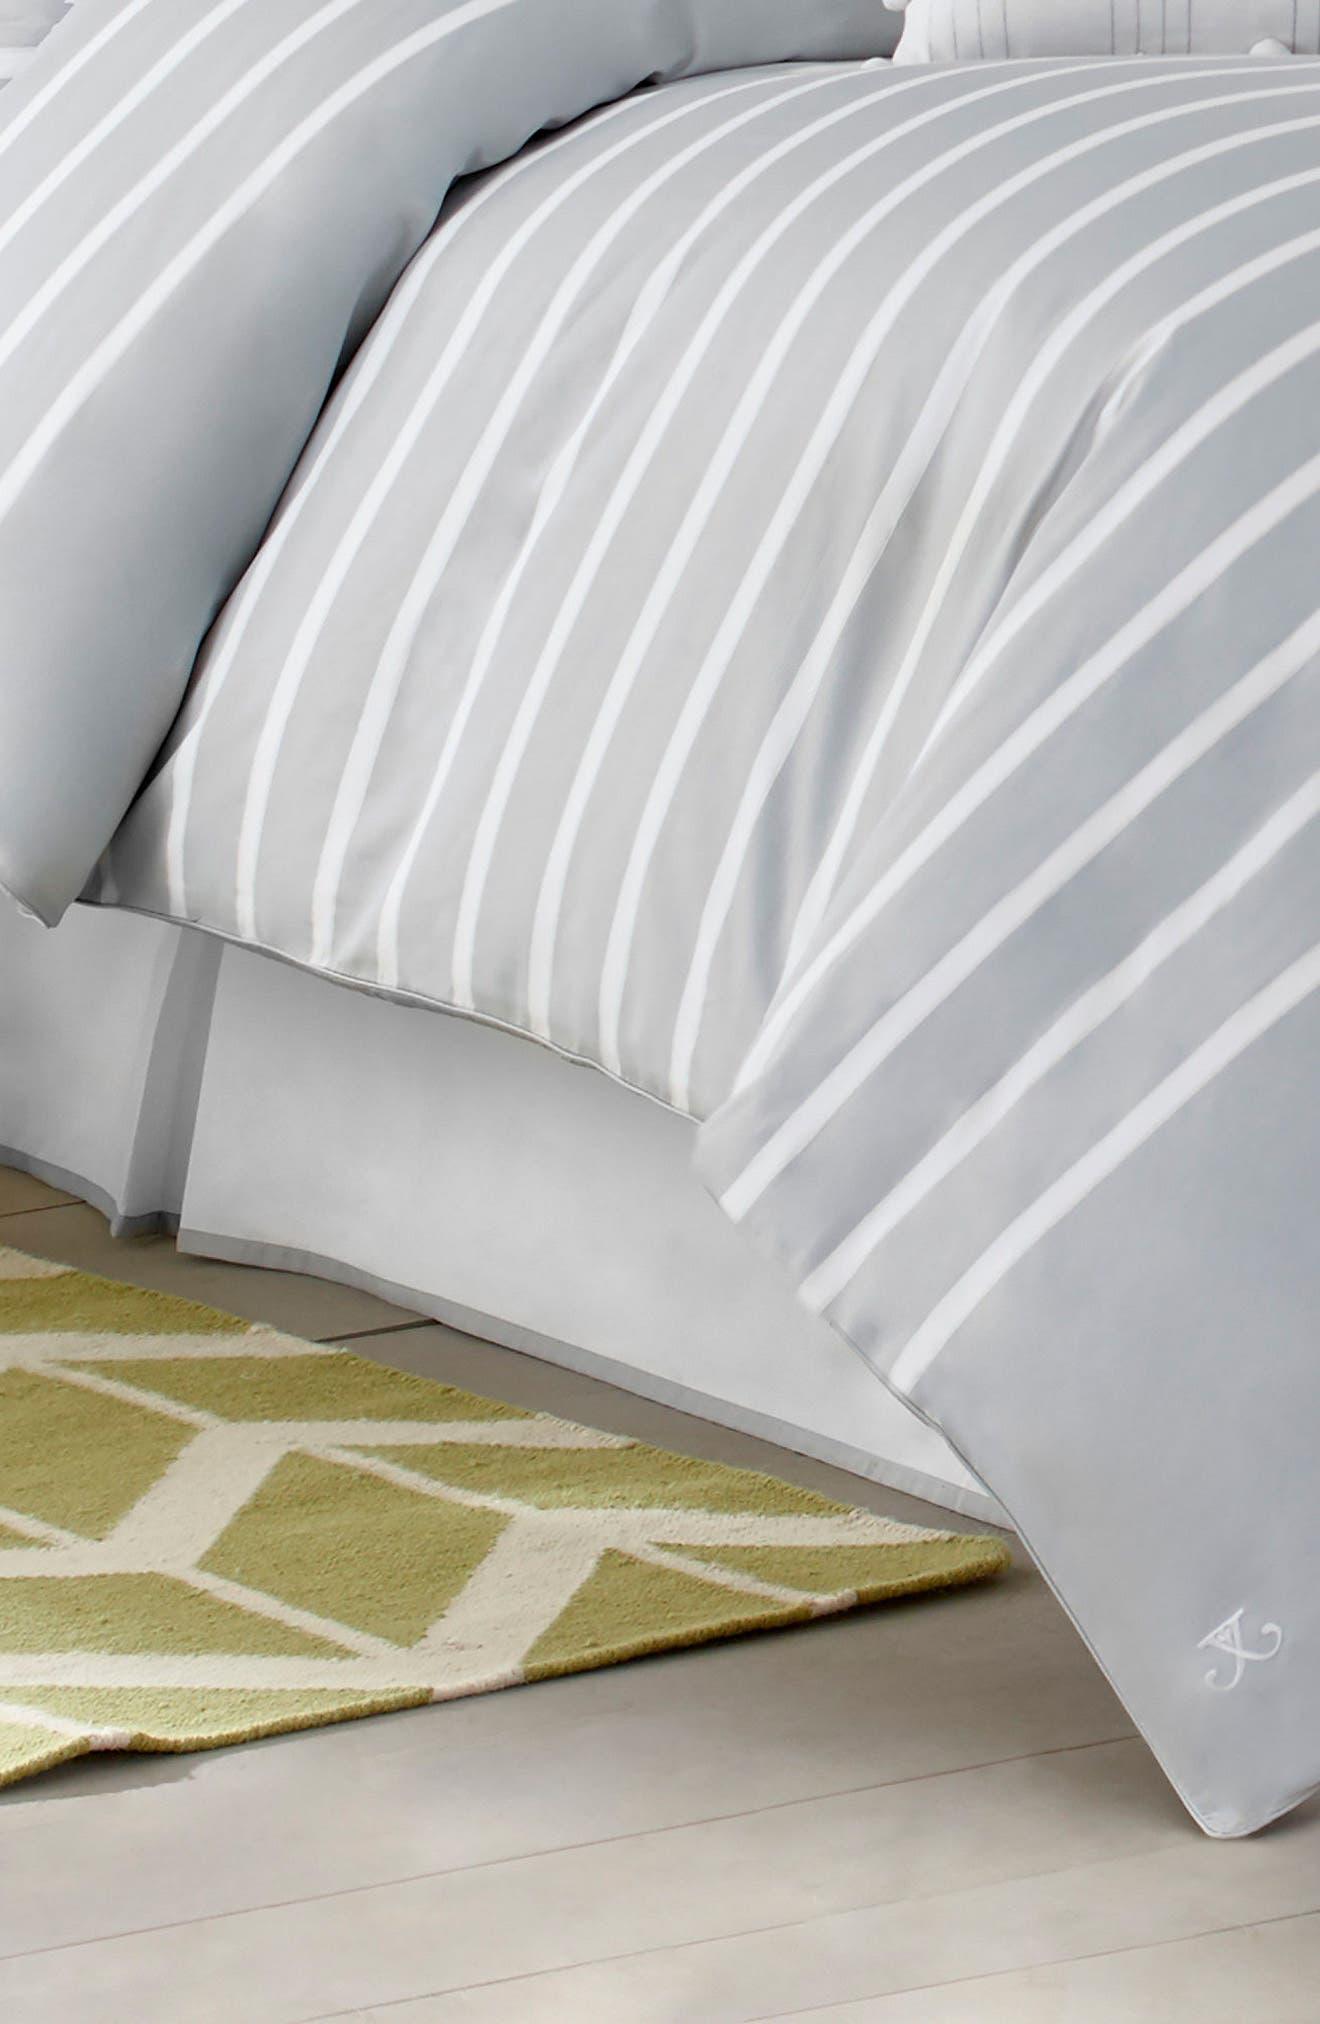 JILL ROSENWALD Capri Stripe Bed Skirt, Main, color, 020